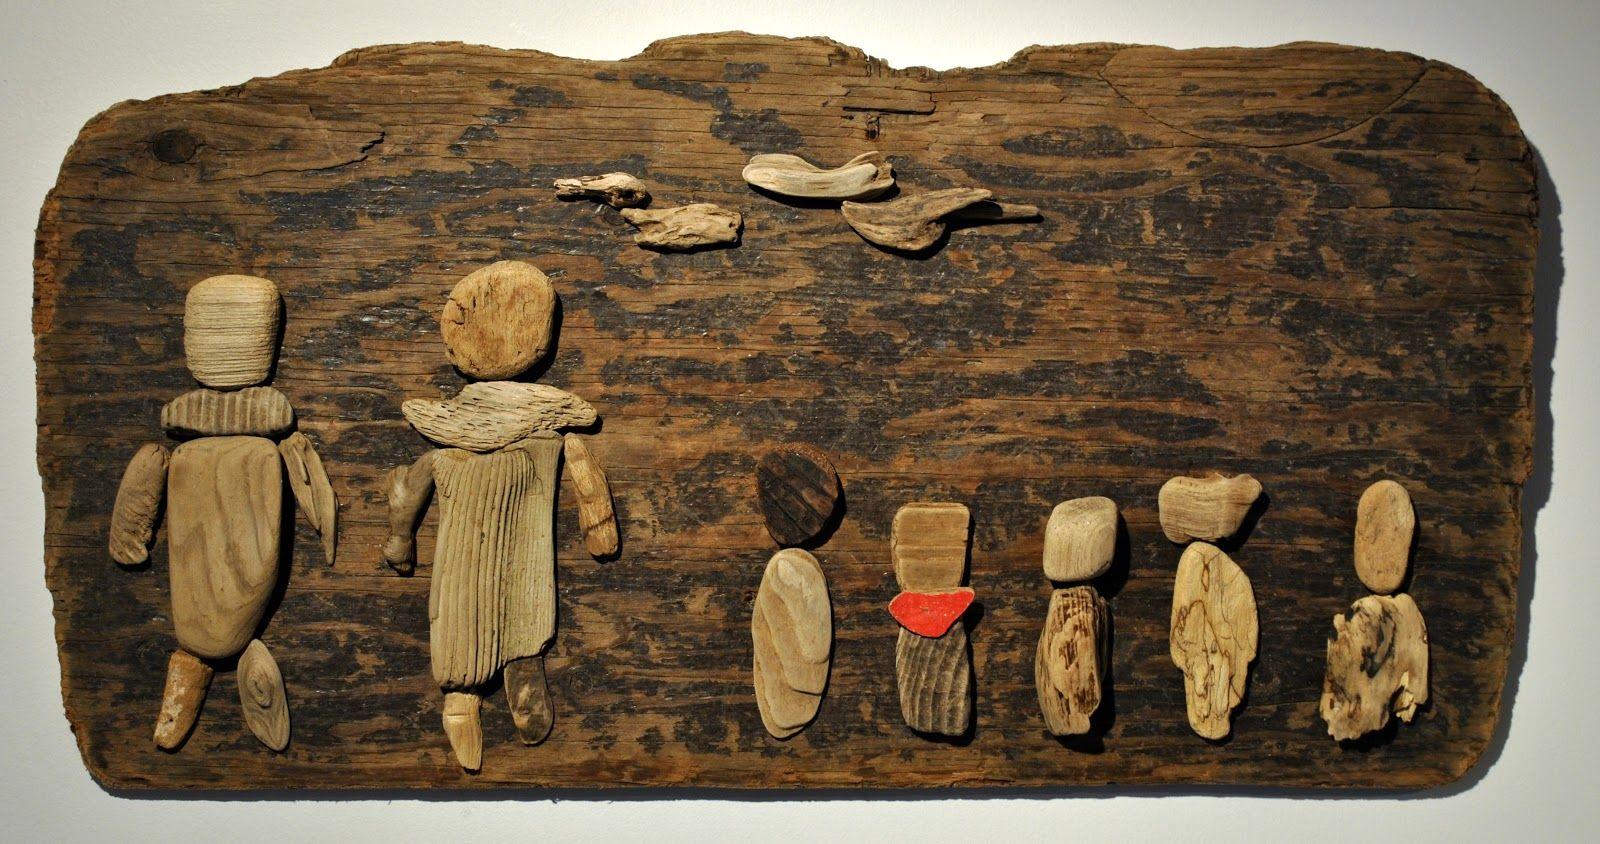 tableau de bois flott de l 39 atelier bertrand bois flott driftwood art pinterest. Black Bedroom Furniture Sets. Home Design Ideas